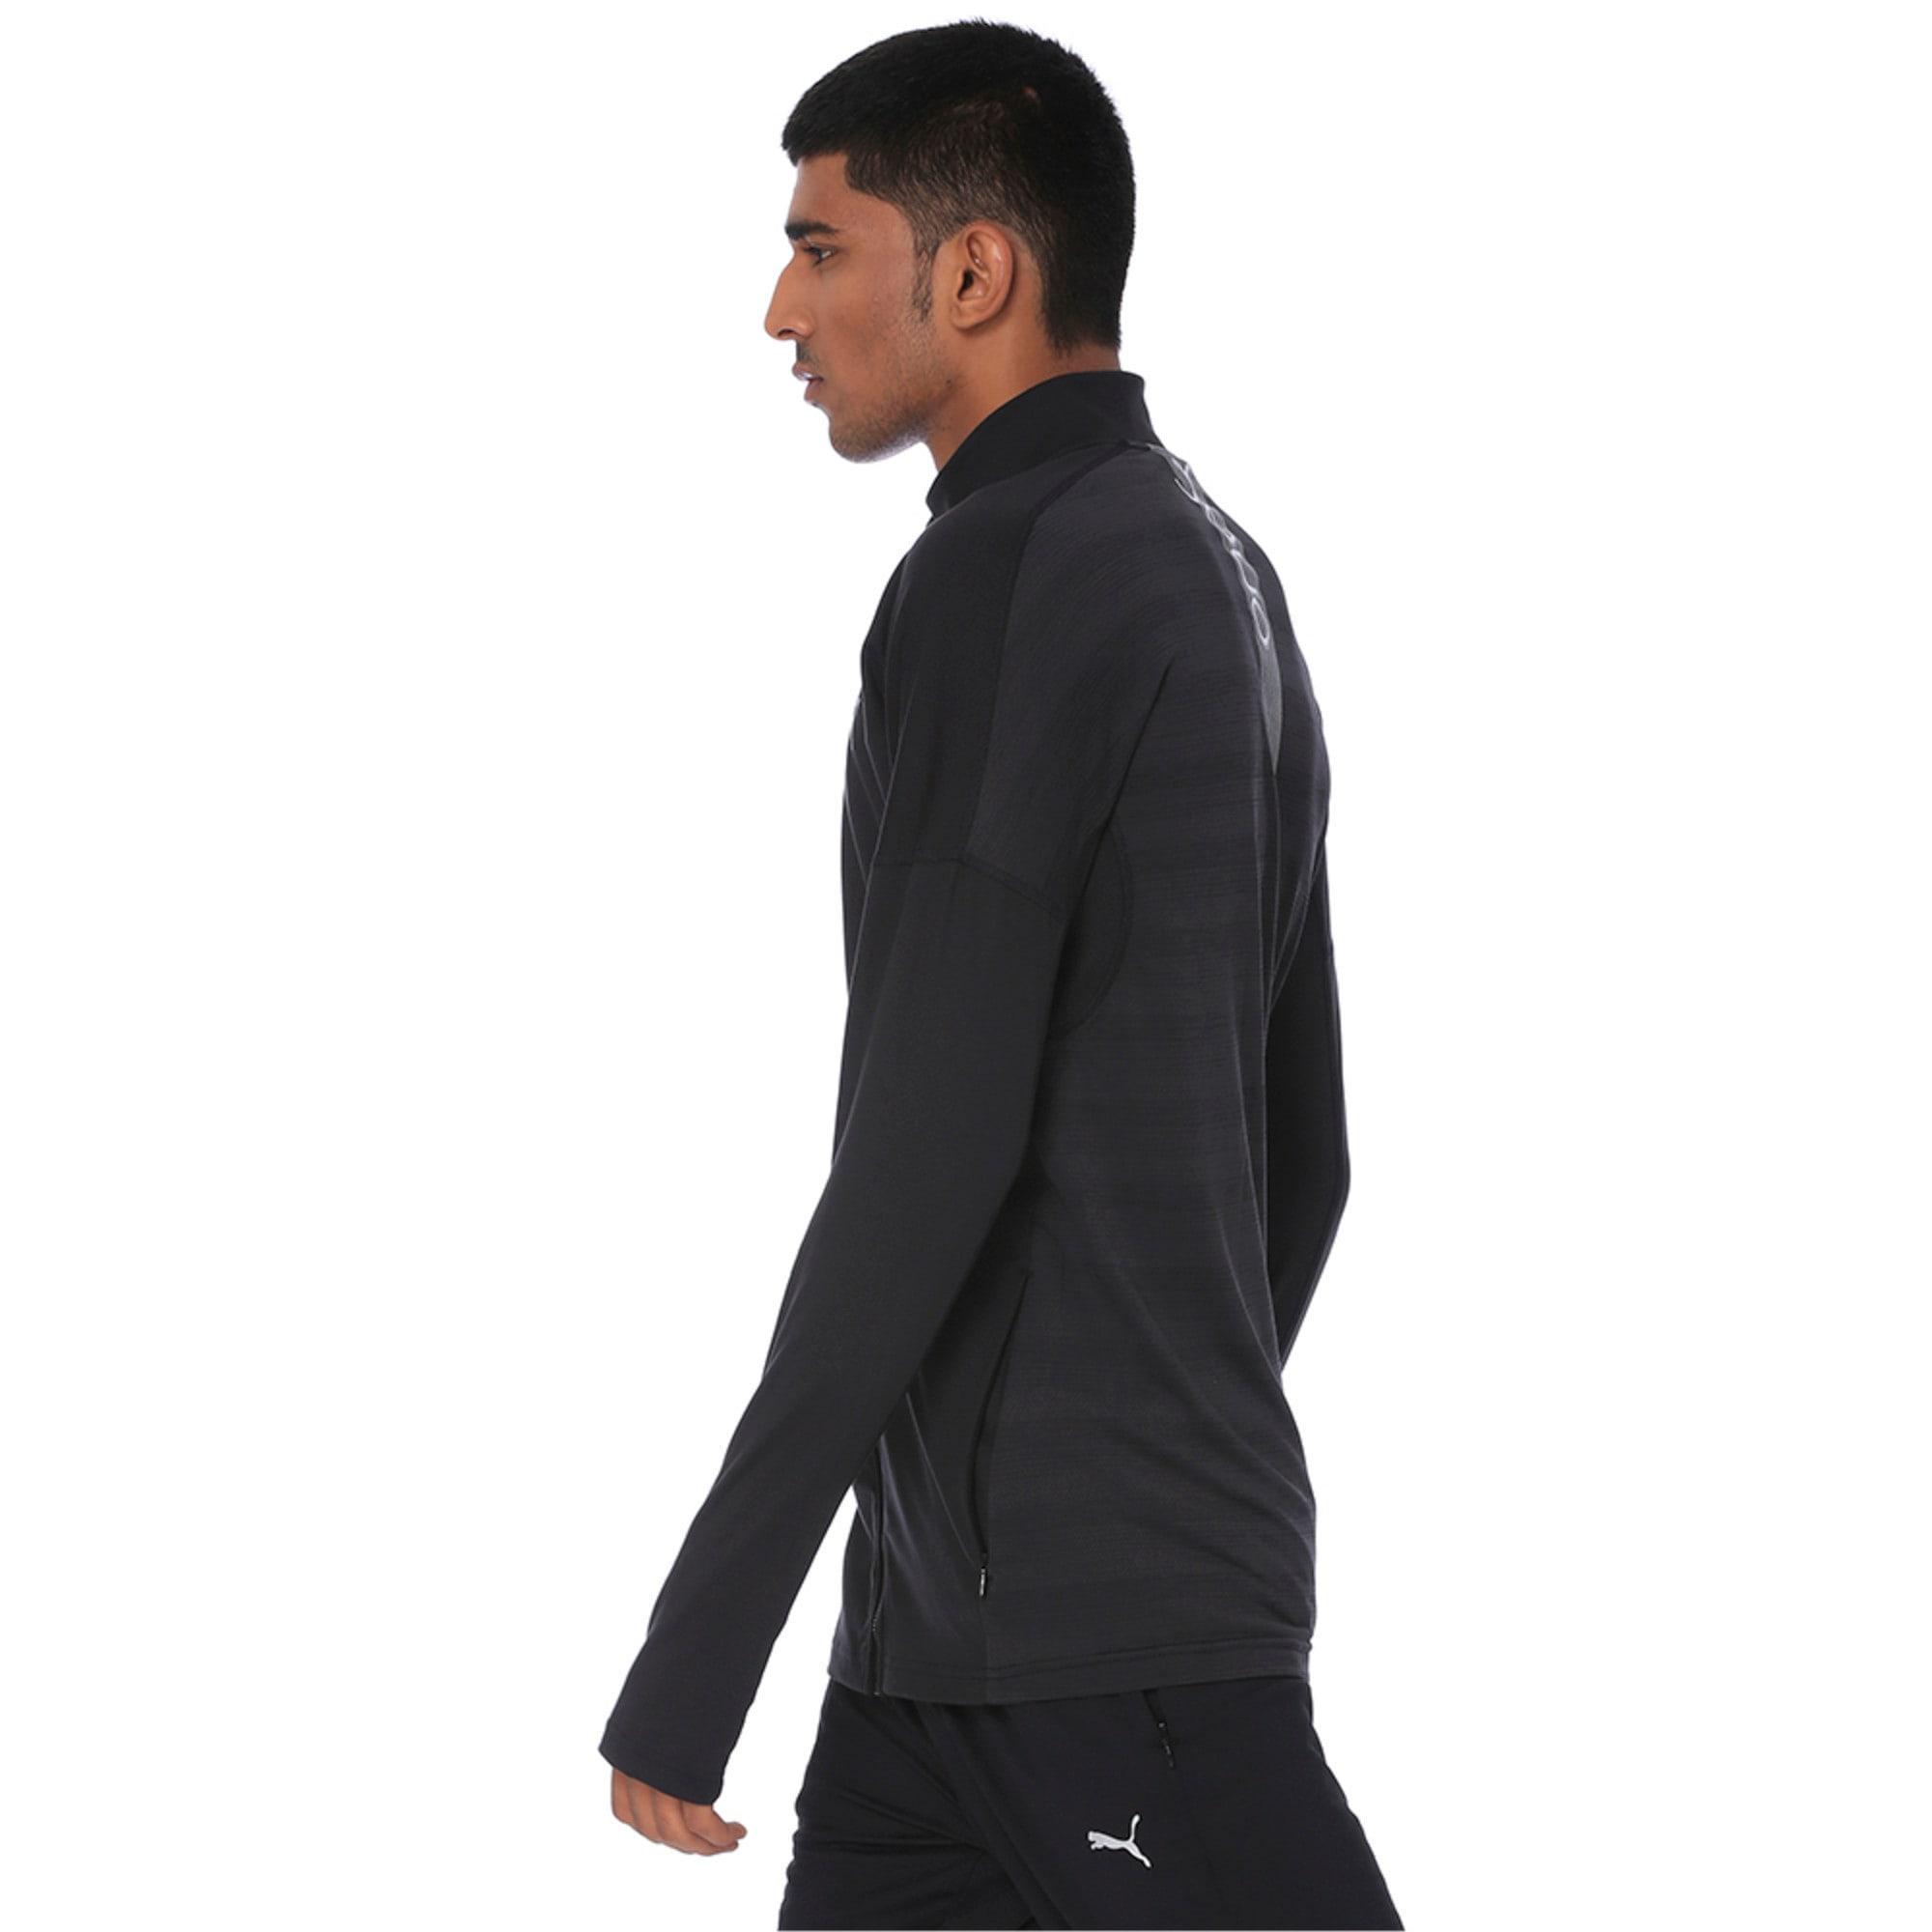 Thumbnail 3 of one8 VK Active Men's Full Zip Sweat Jacket, Puma Black, medium-IND